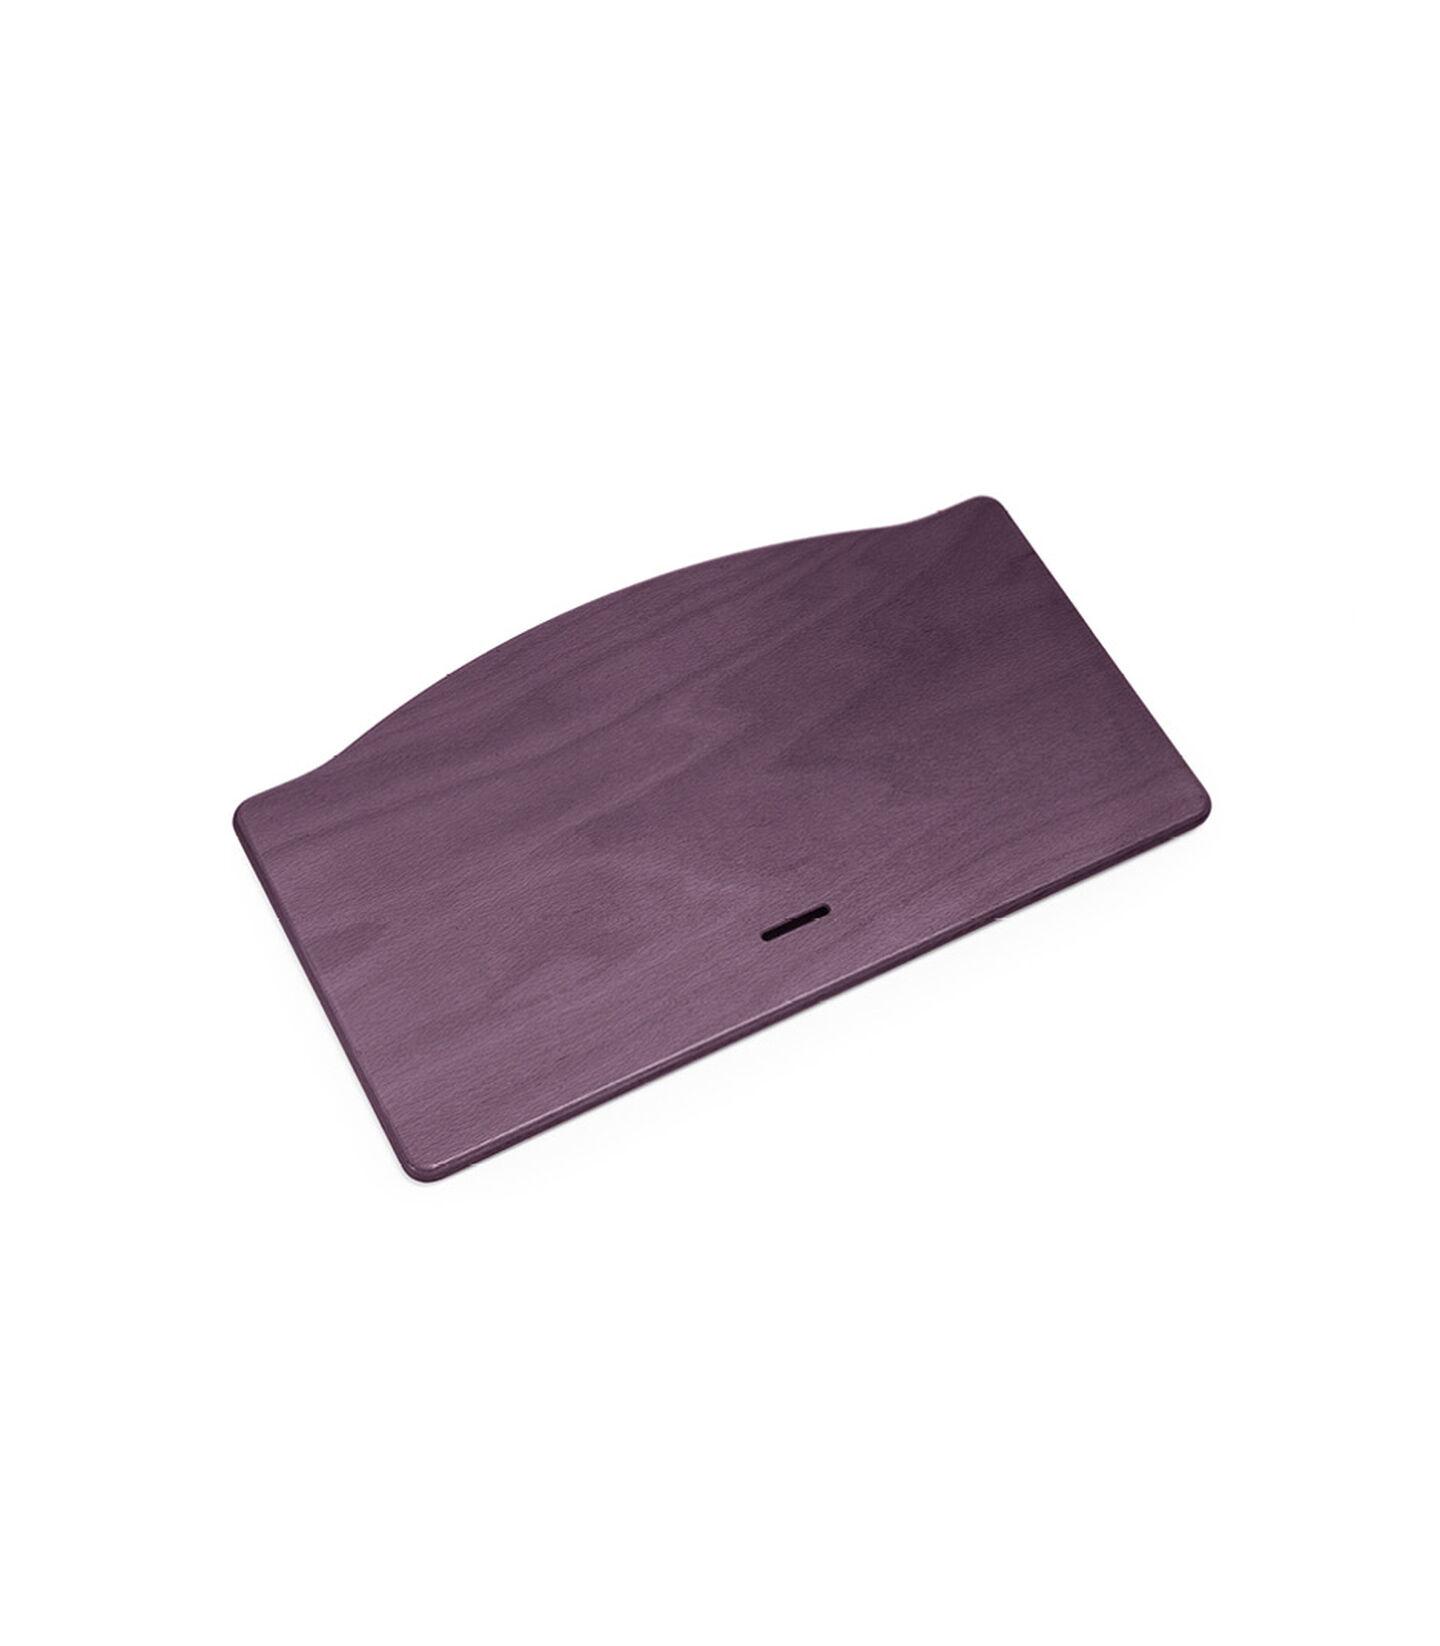 Tripp Trapp® Seatplate Plum Purple, Prugna, mainview view 2